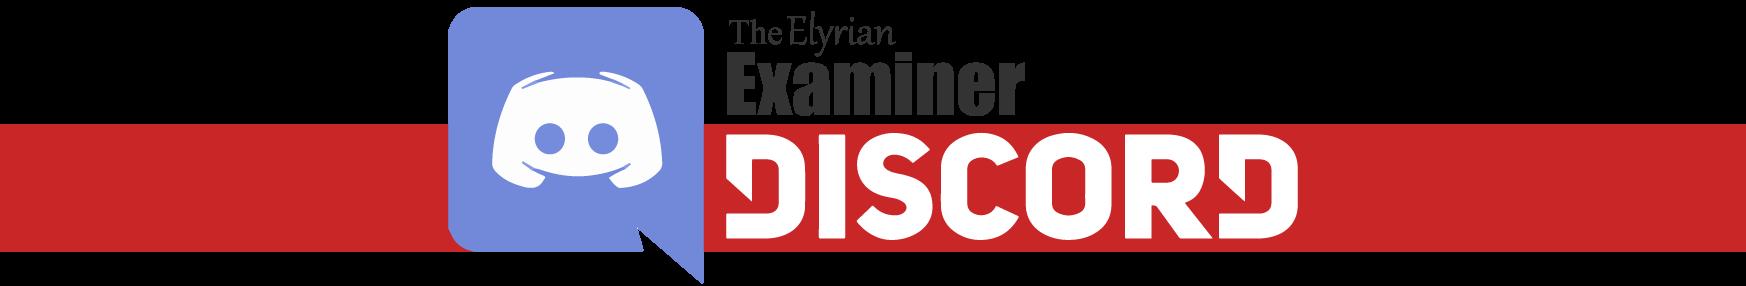 Elyrian Examiner Discord